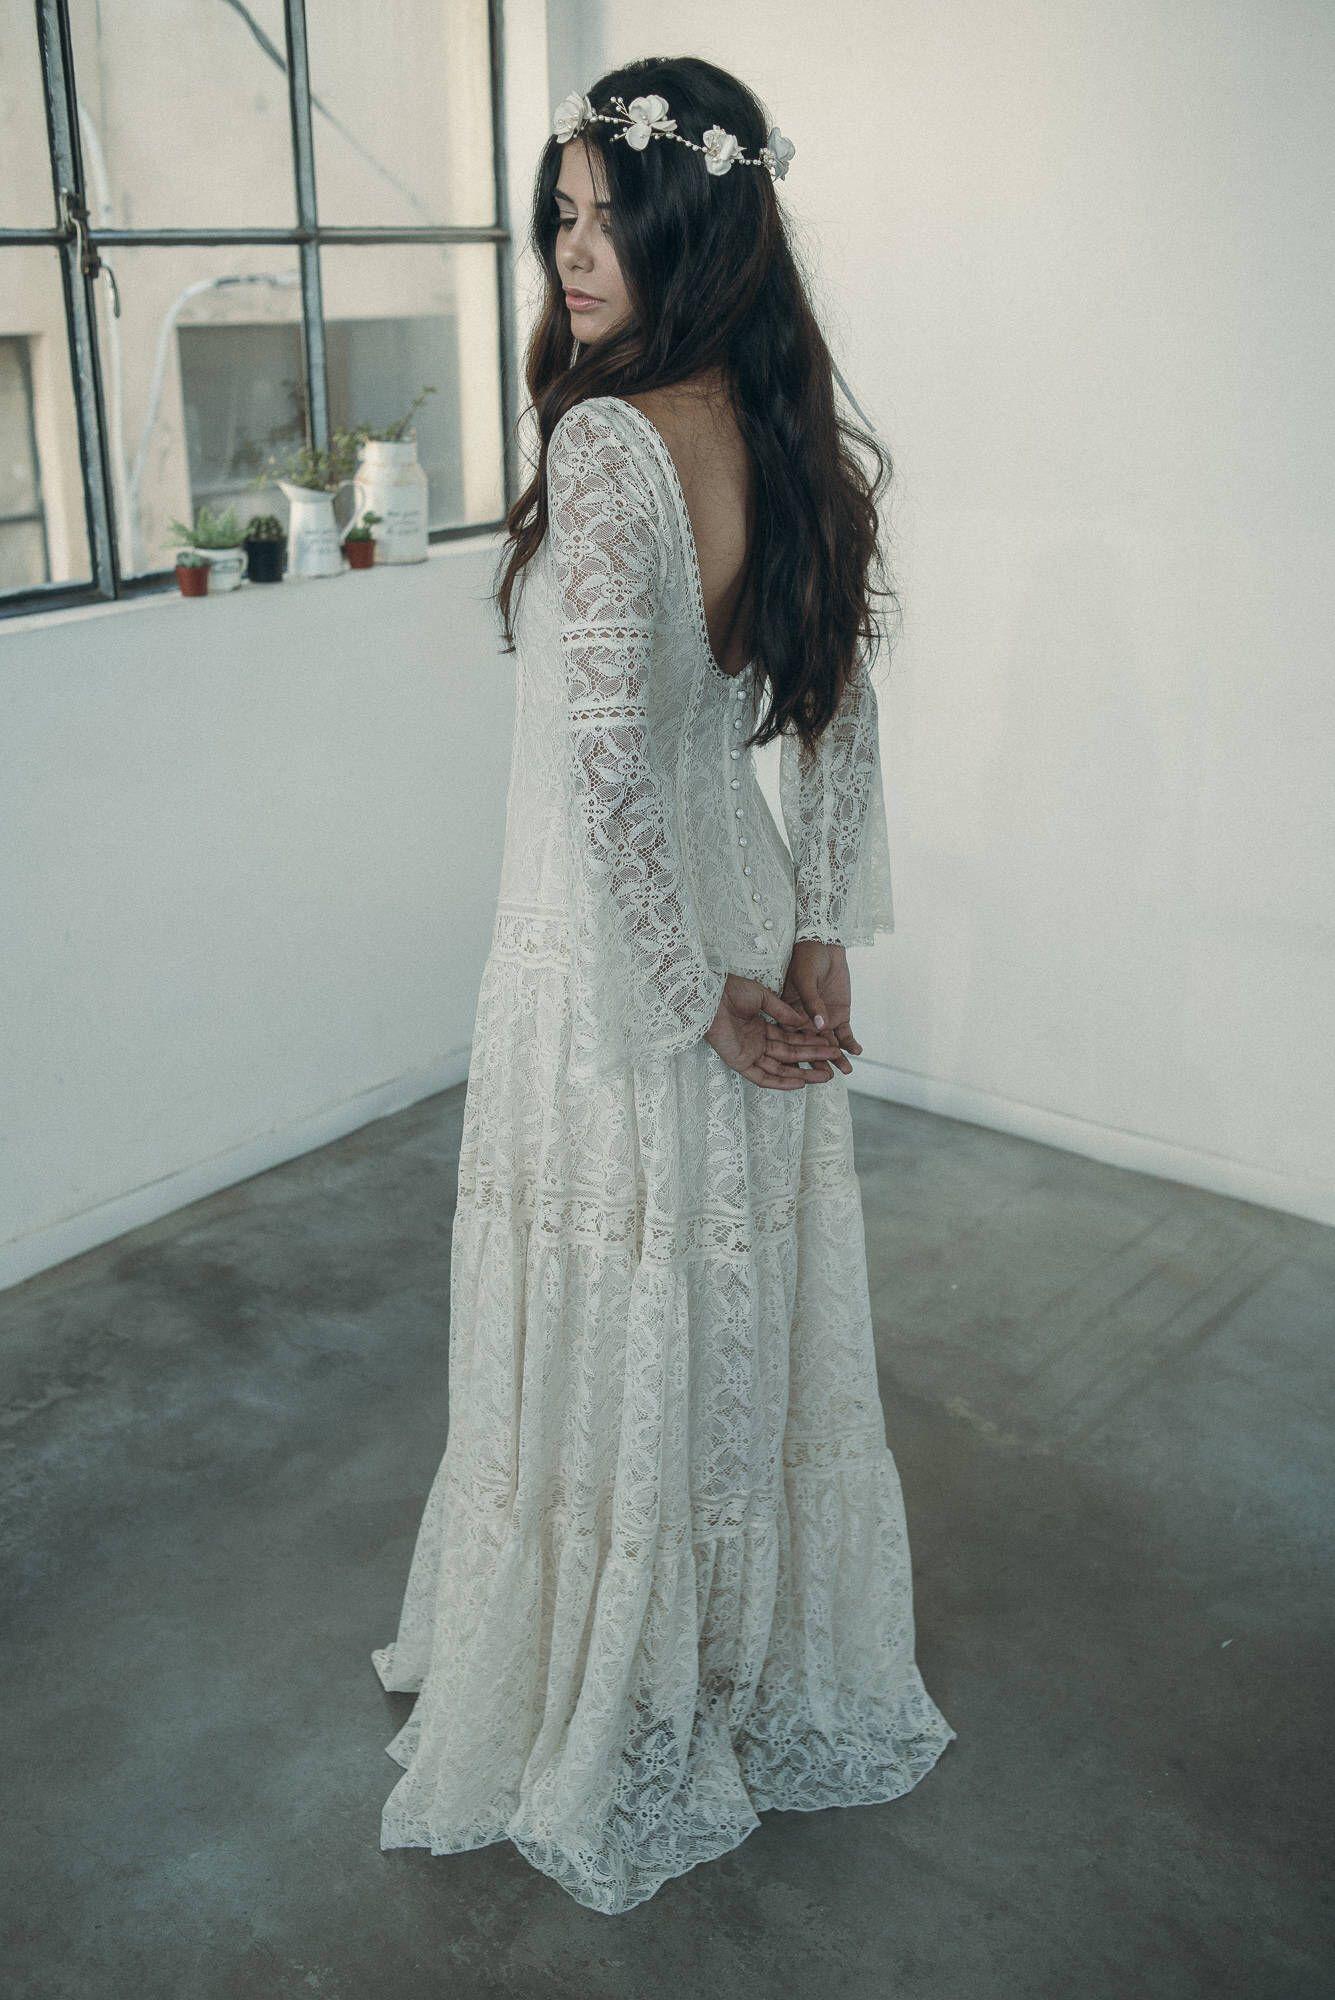 Wedding dress long sleeve lace wedding dress boho wedding dress